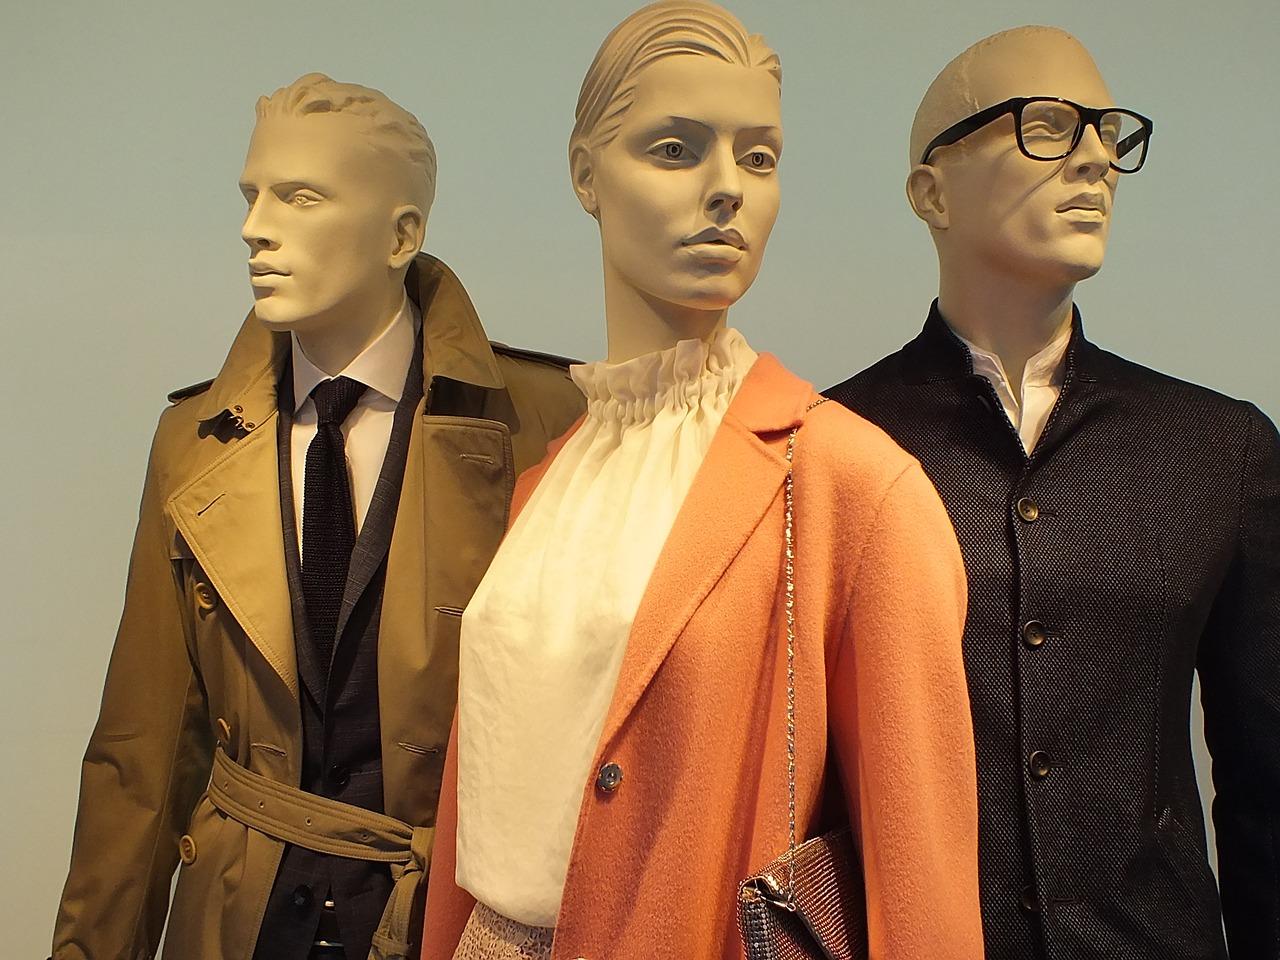 Three department store mannequins